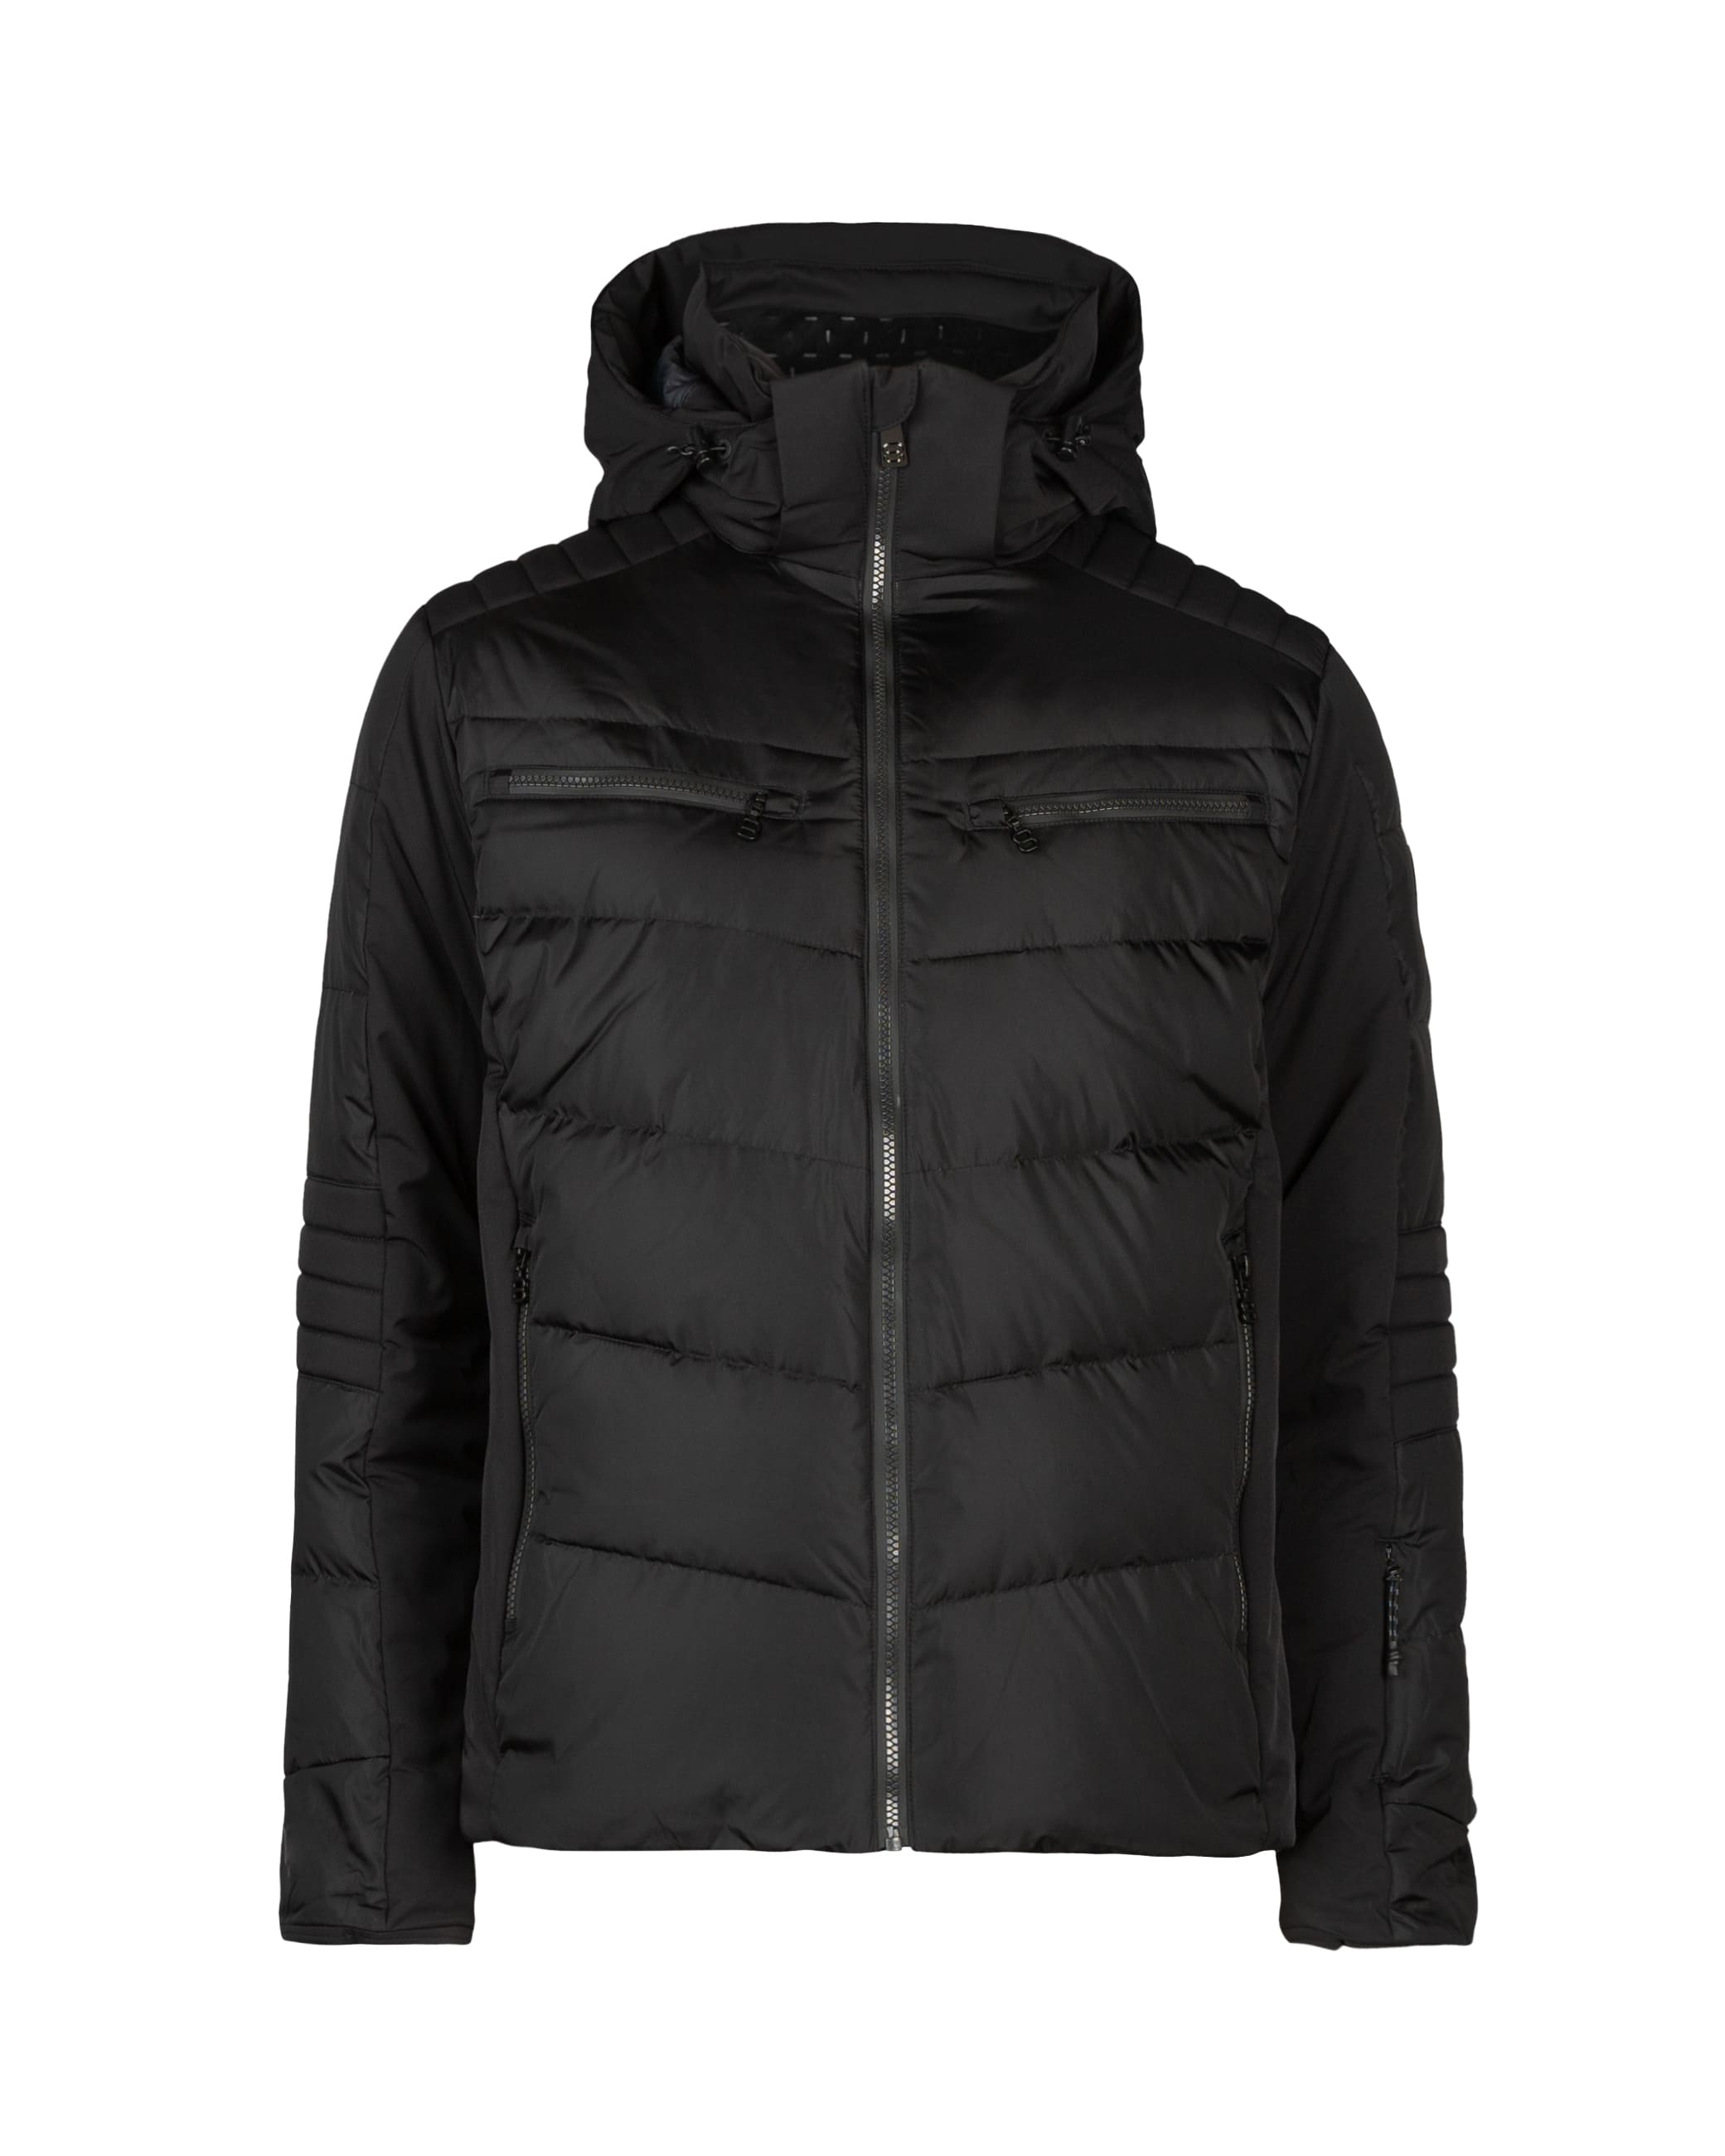 8848 Altitude M Halstone Jacket 2022